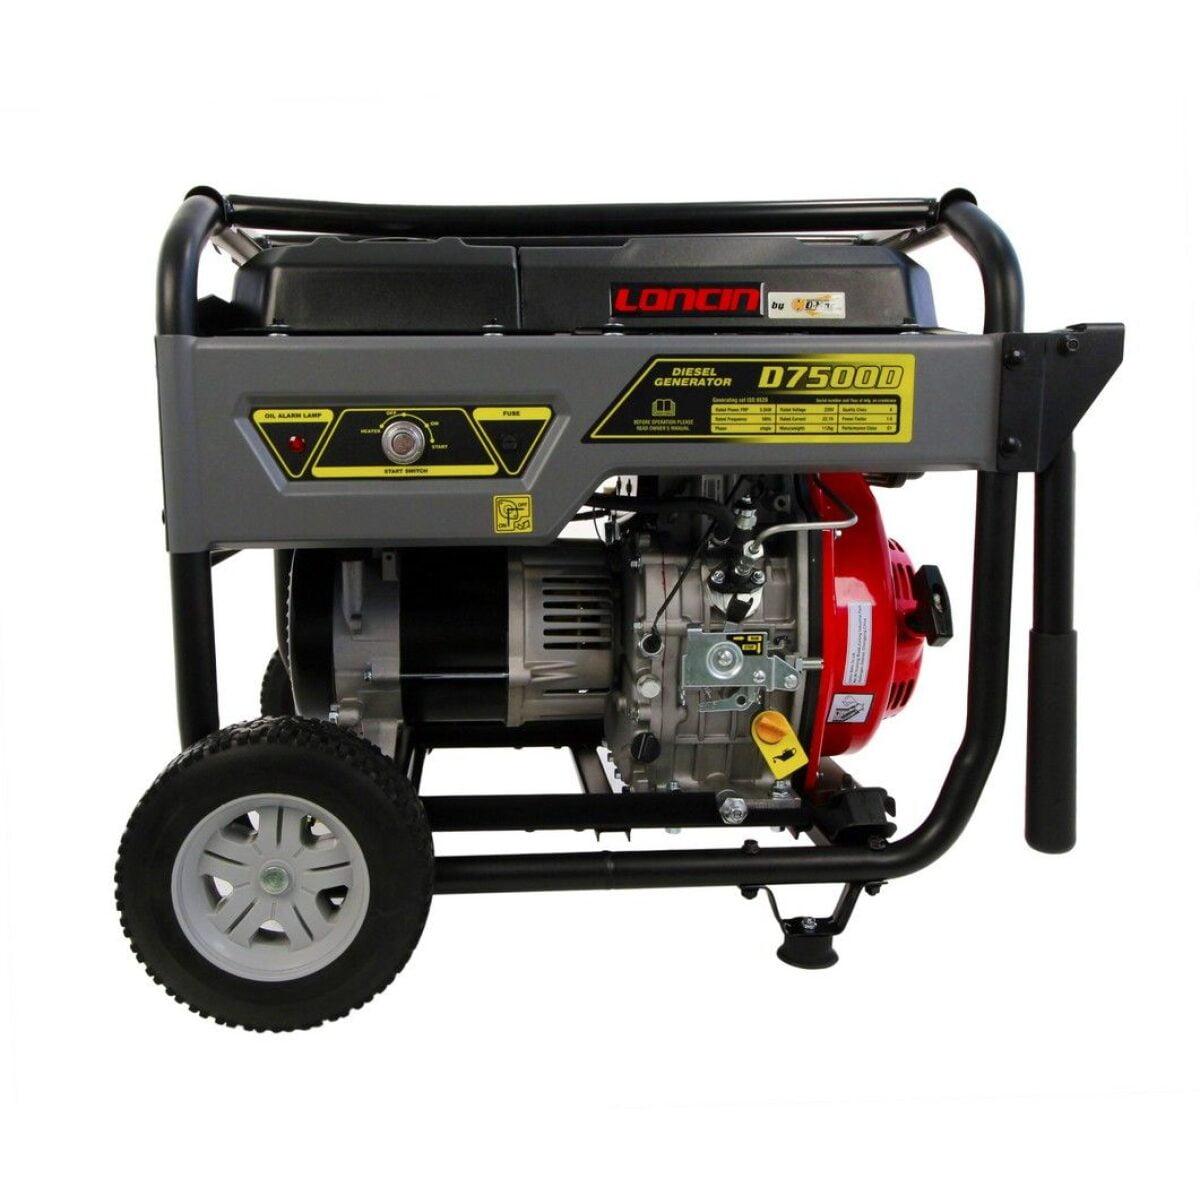 lcd7500d generator loncin 6 0kw 220v diesel o mac.ro 1